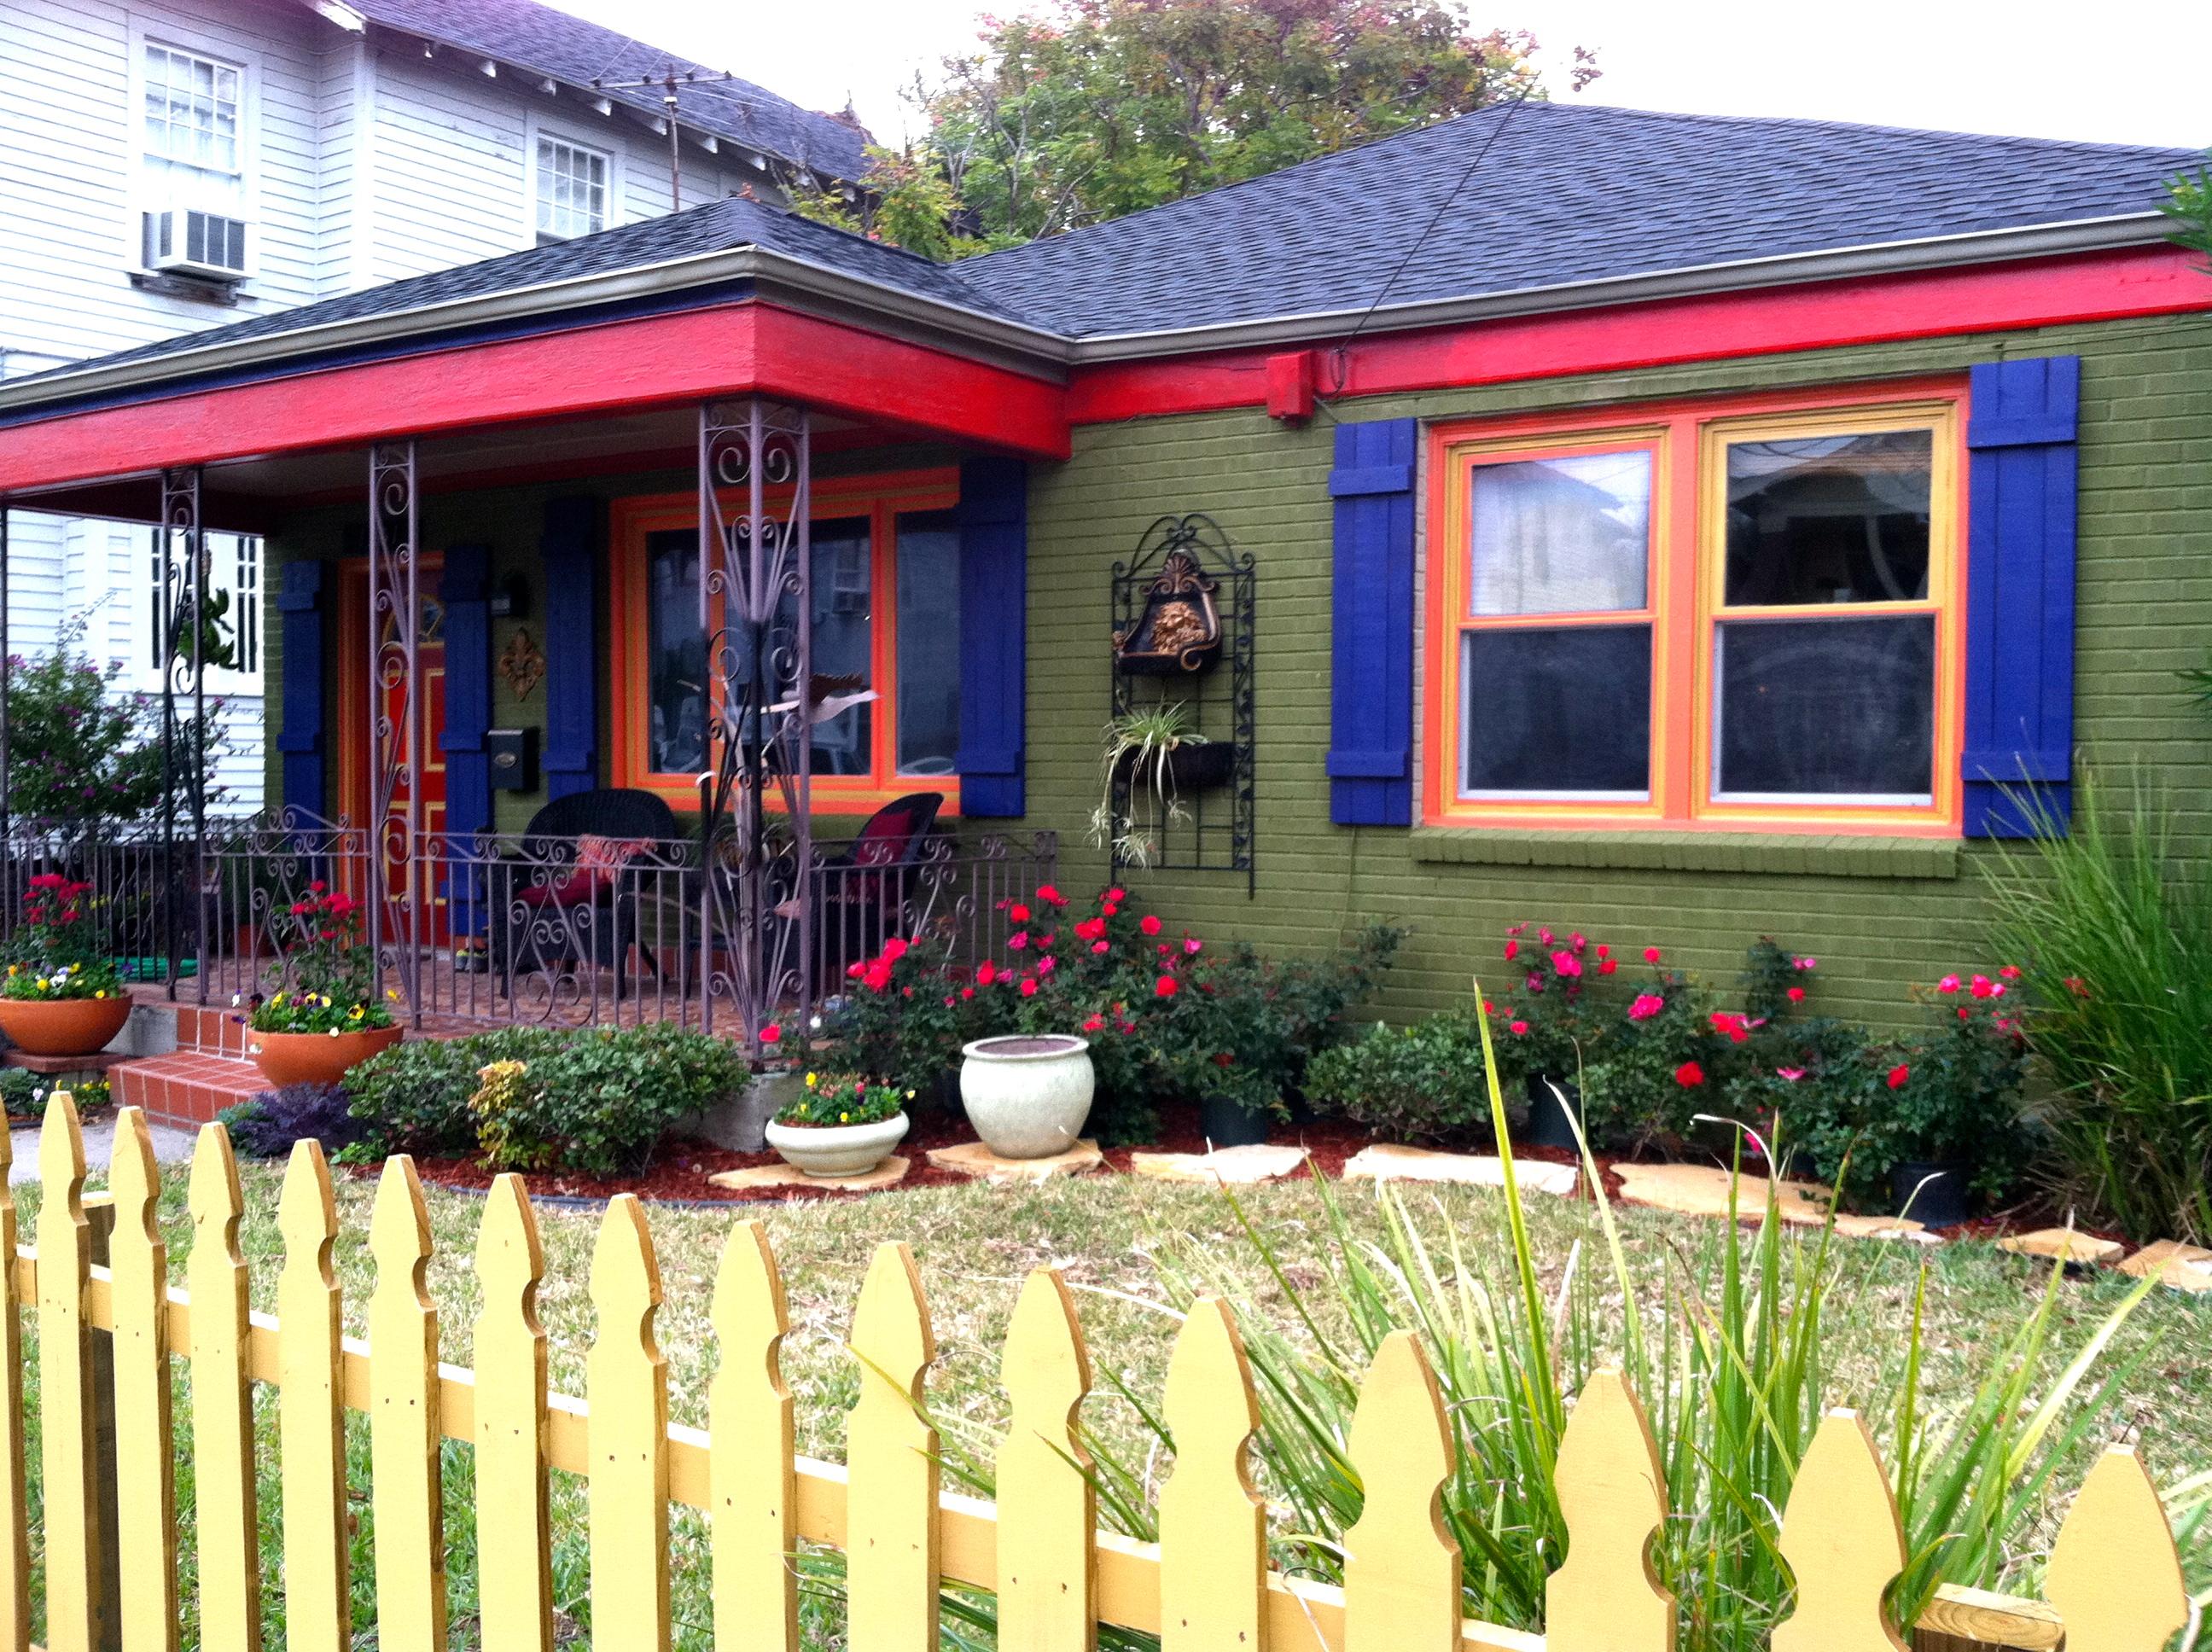 Exterior house paint ideas green - New Orleans House Paint Colors